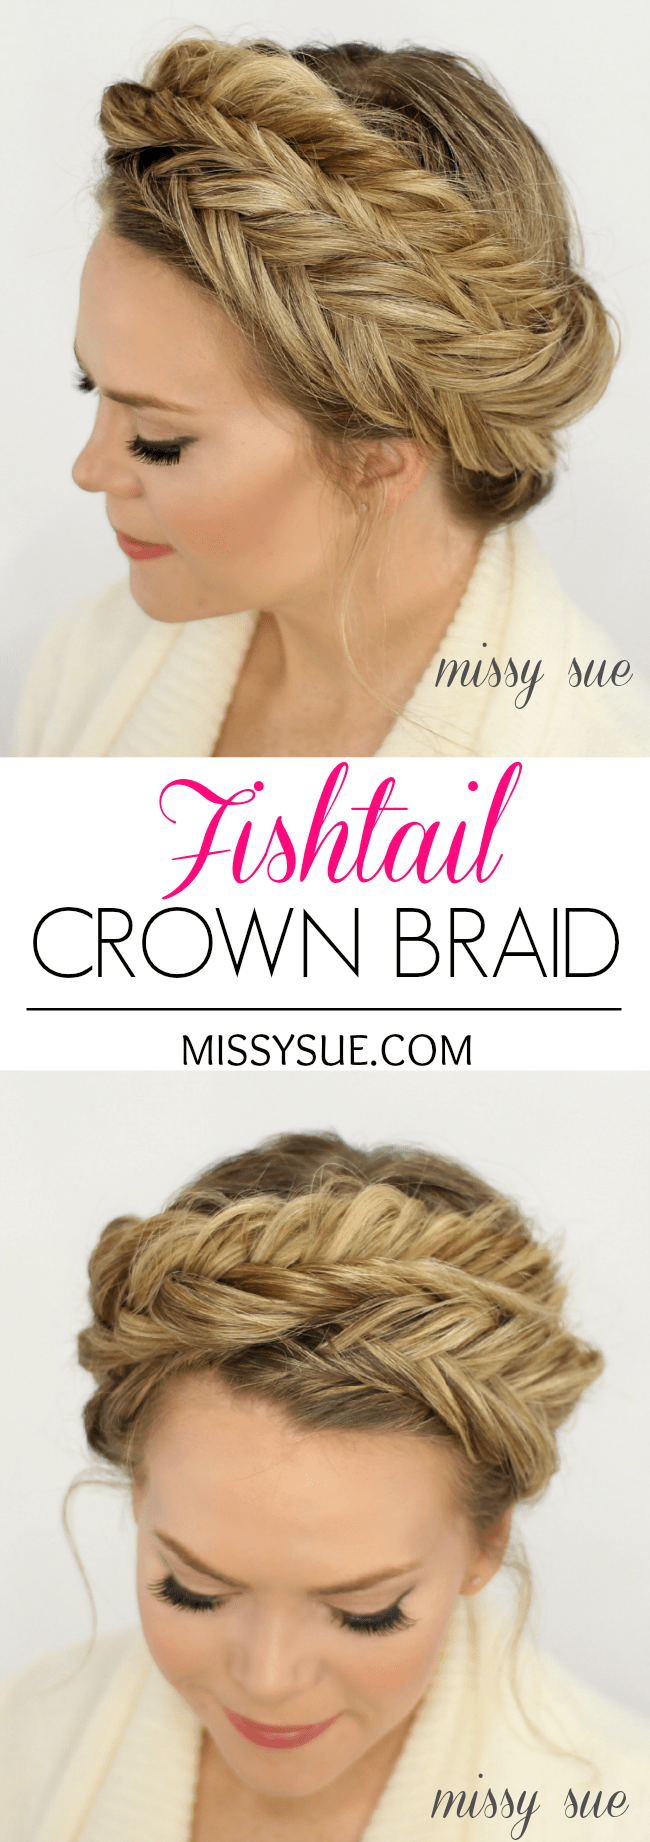 Fishtail Crown Braid | MissySue.com